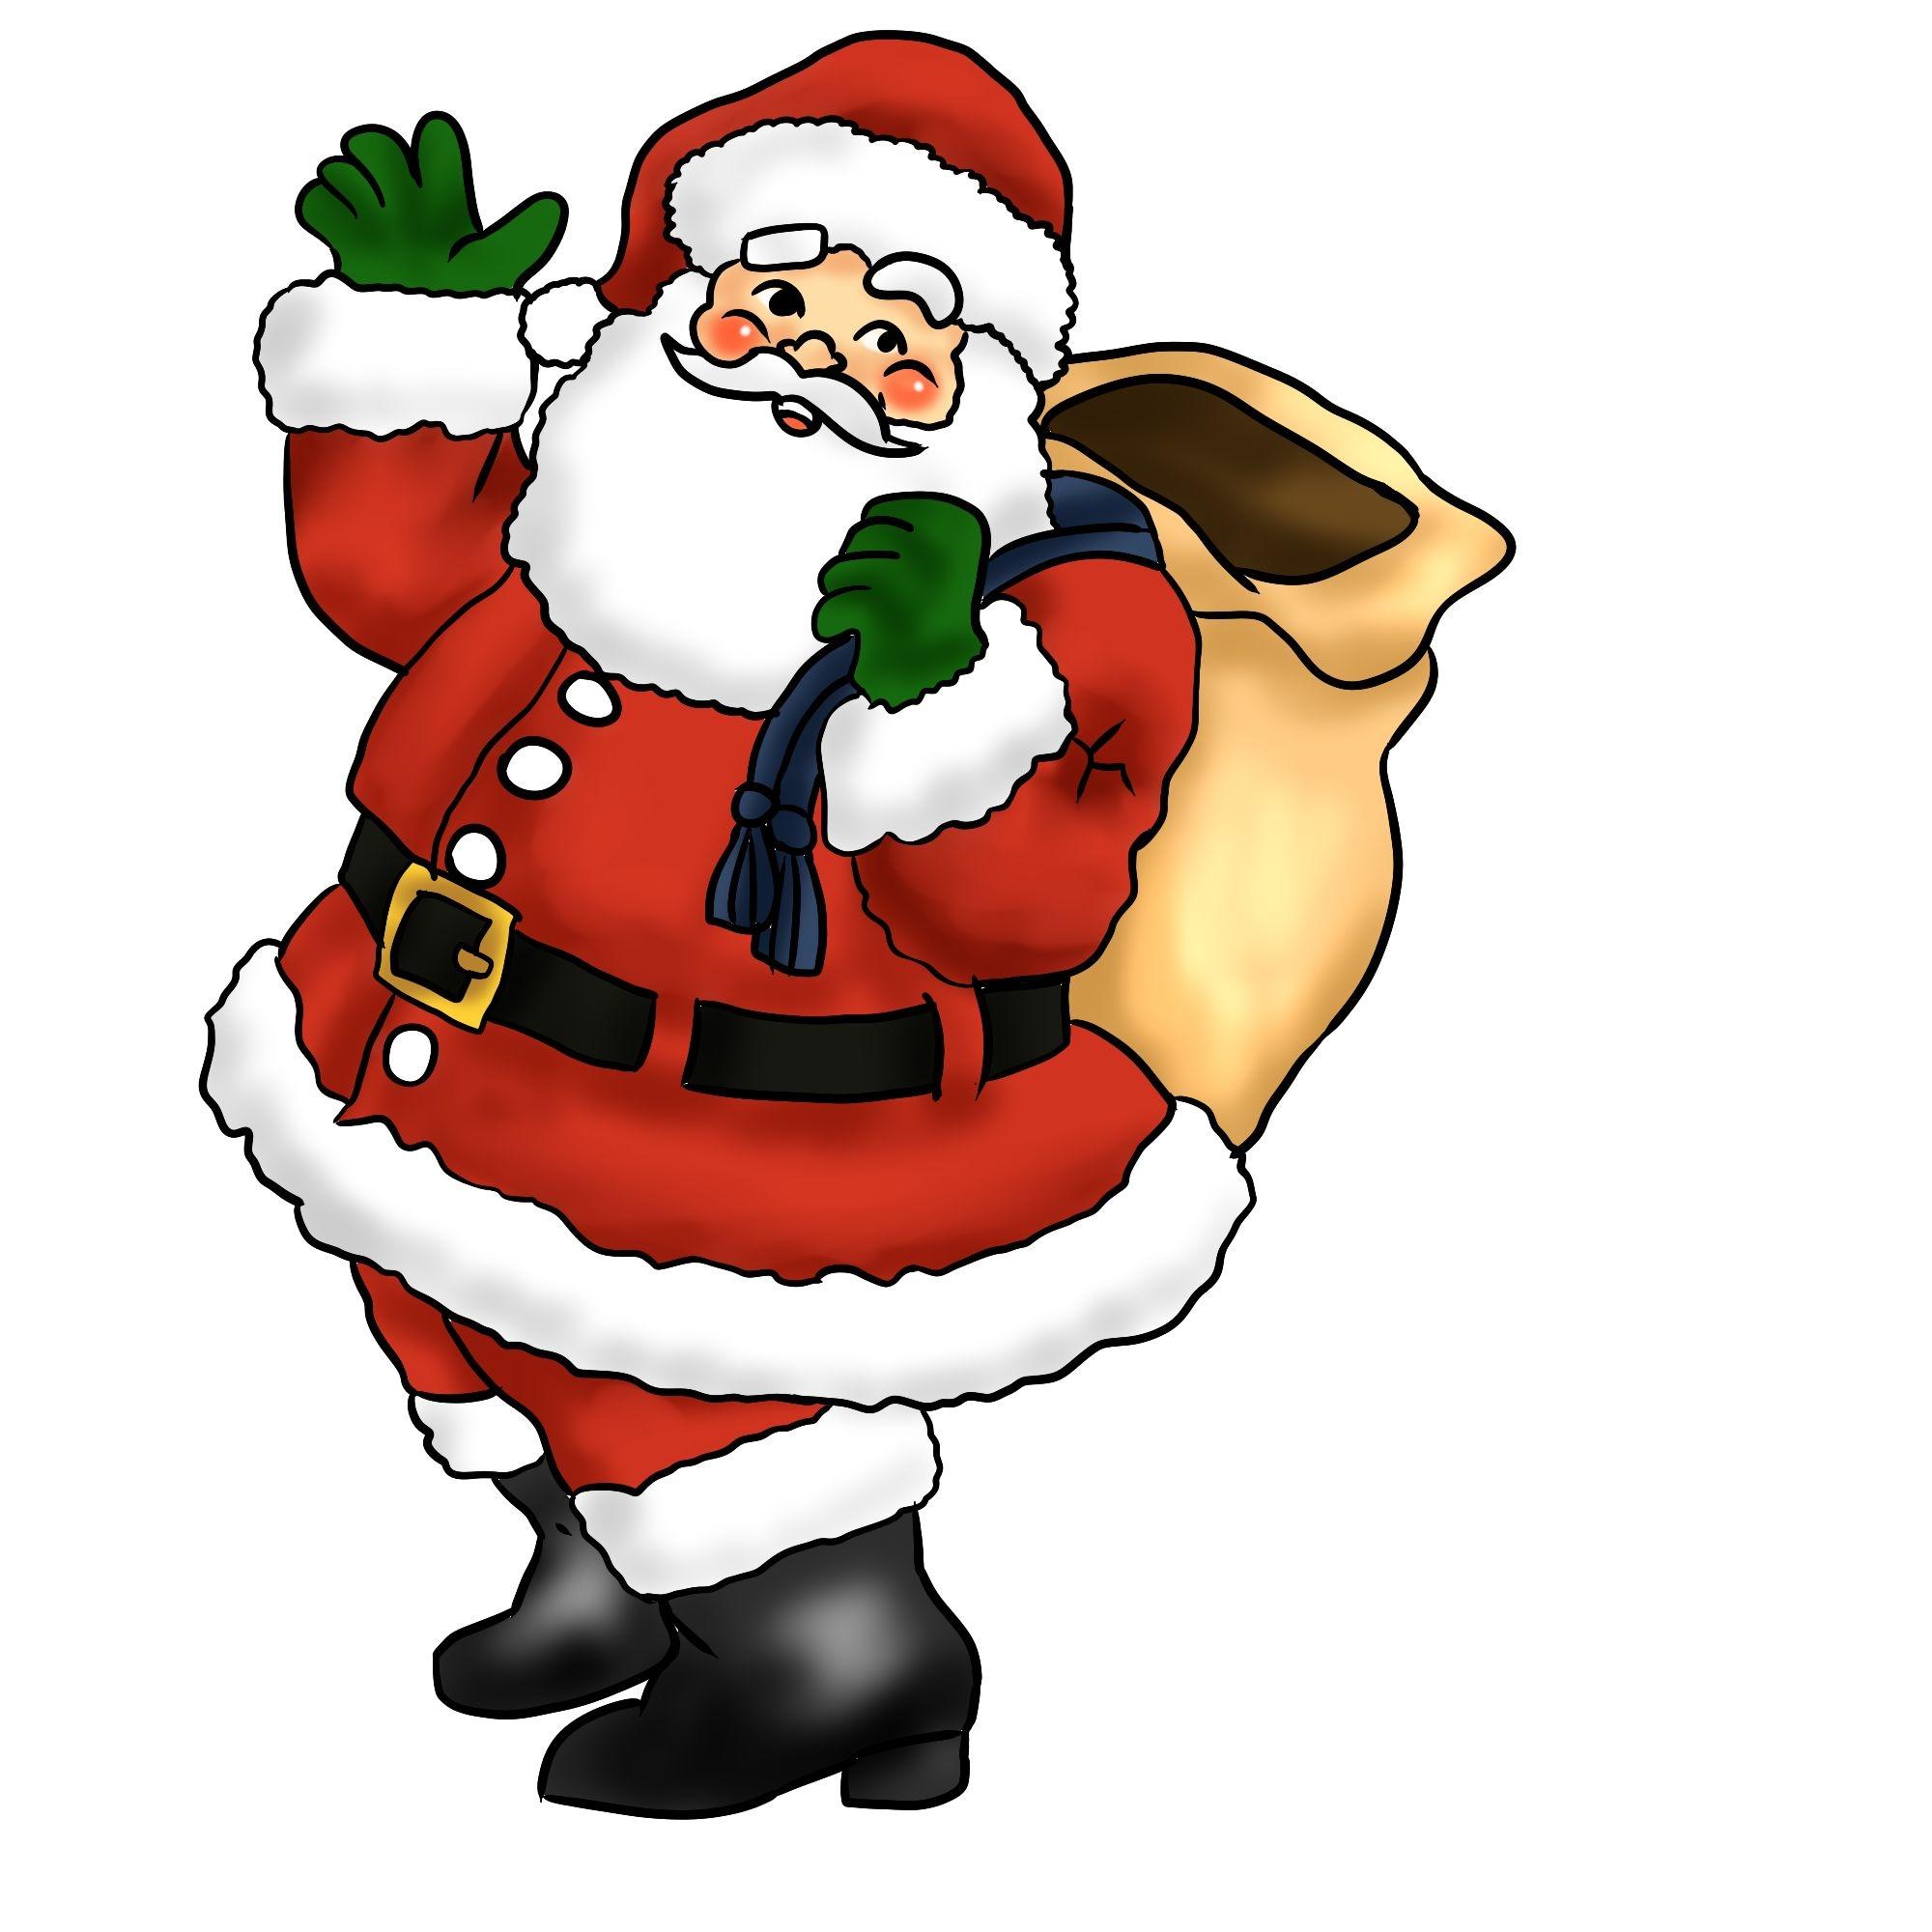 2000x2000 Santa Pictures Clip Art The Free Website Templates